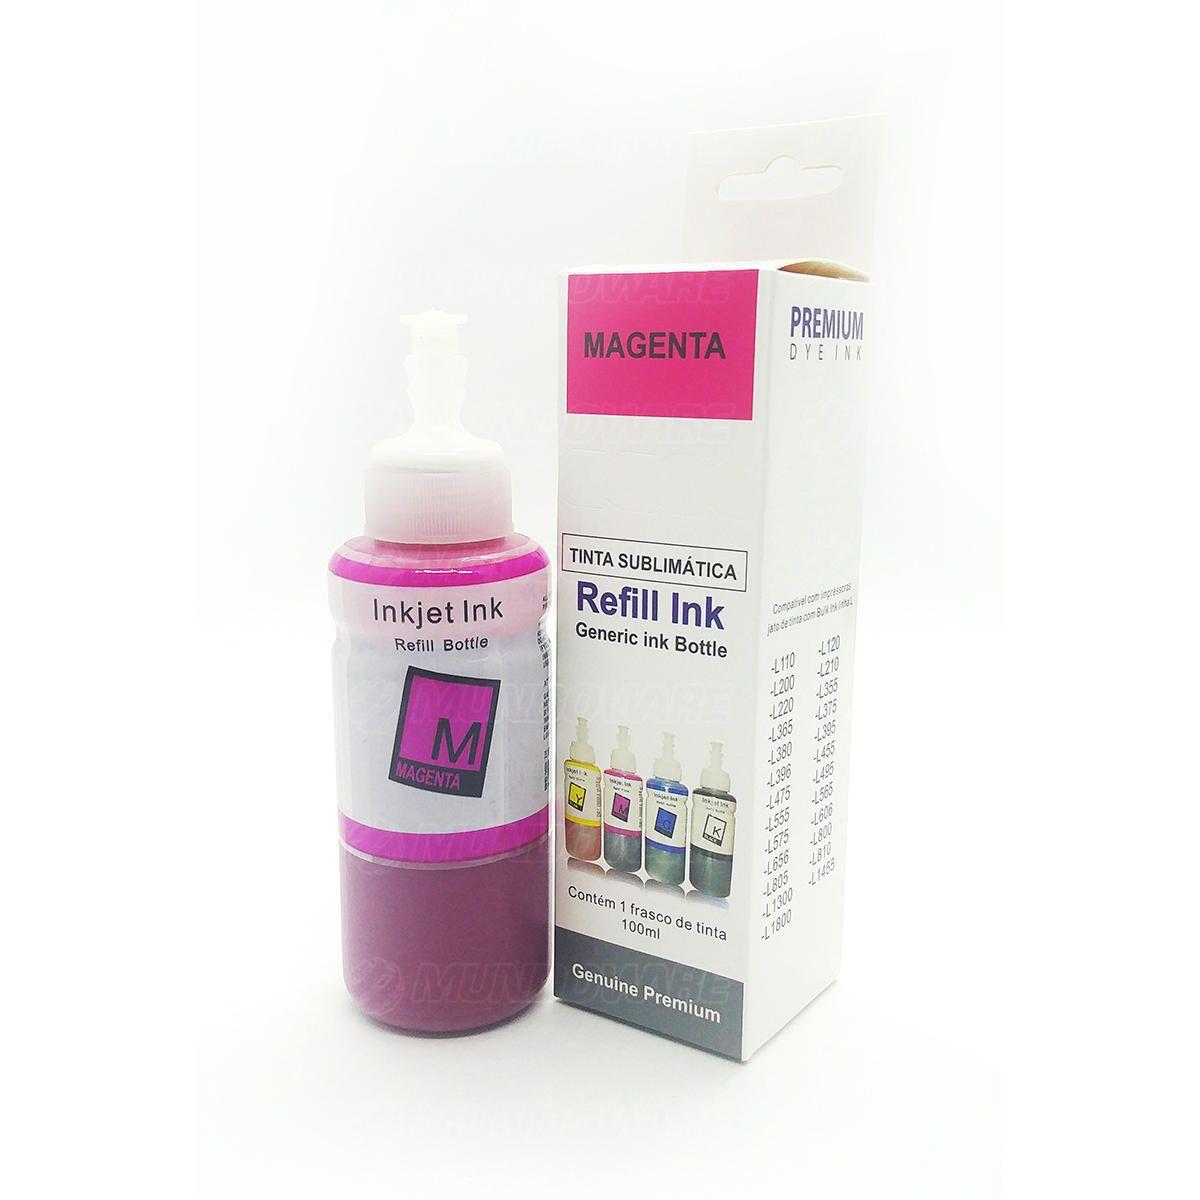 Compatível: Tinta Sublimática Laserteck para Sublimação para Epson L200 L355 L365 L380 L455 L565 / Magenta / Refil 100ml